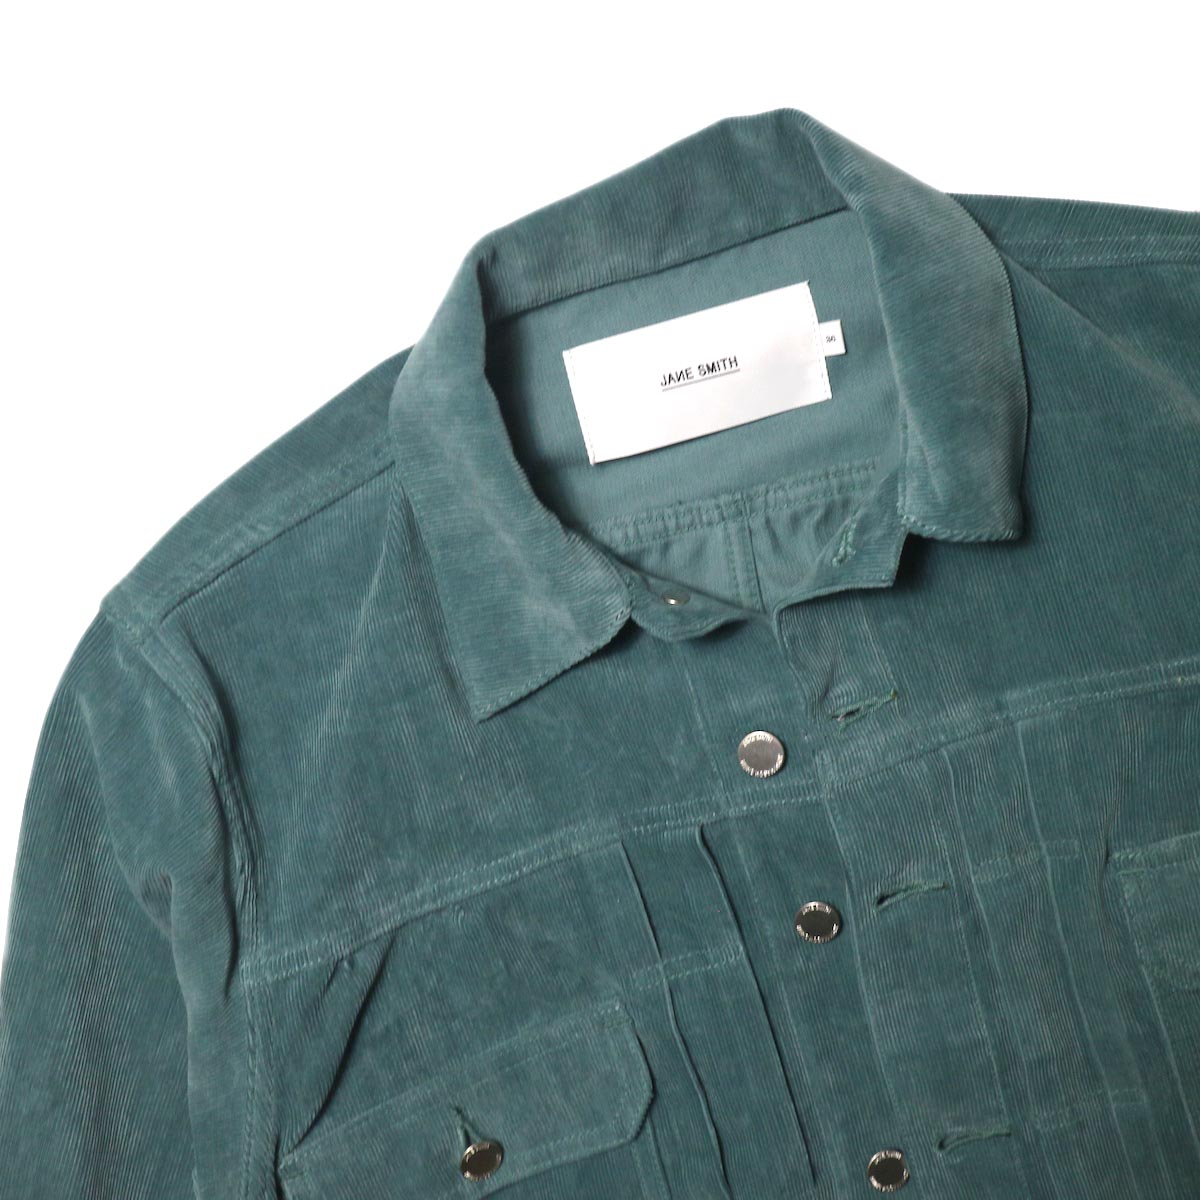 JANE SMITH / TRUCKER JACKET (jade green) 襟